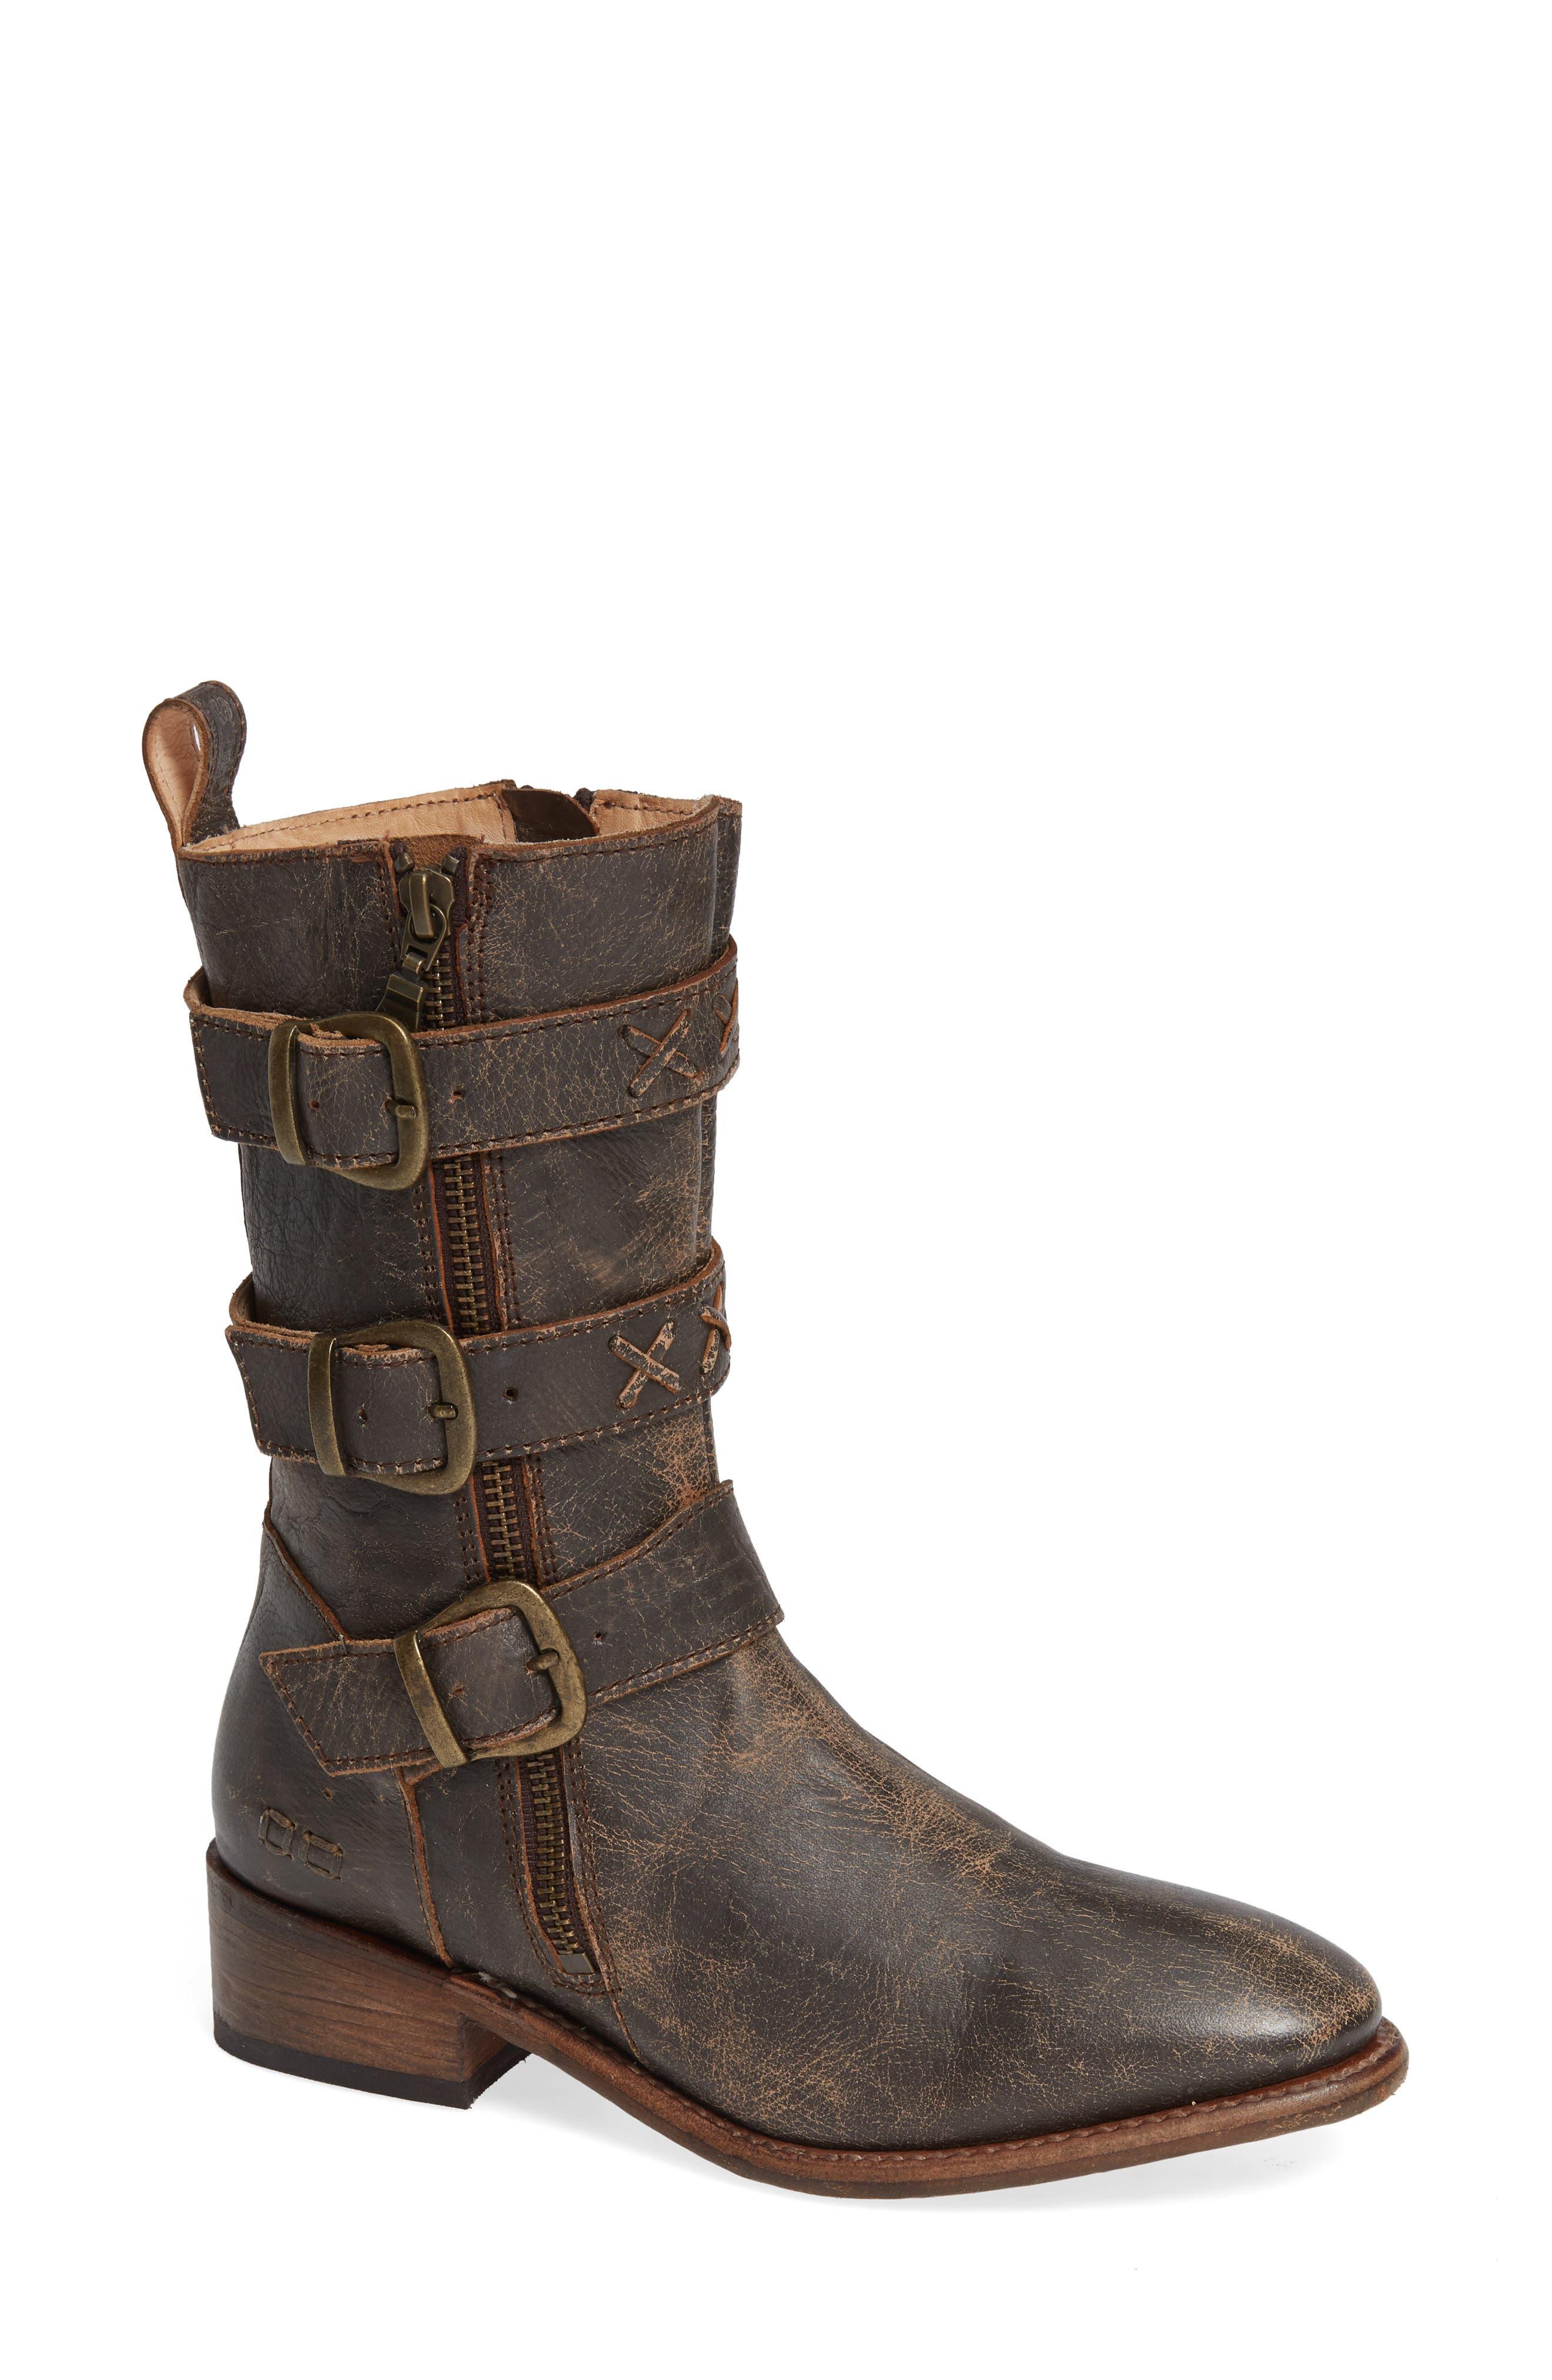 Bed Stu Blanchett Boot- Brown